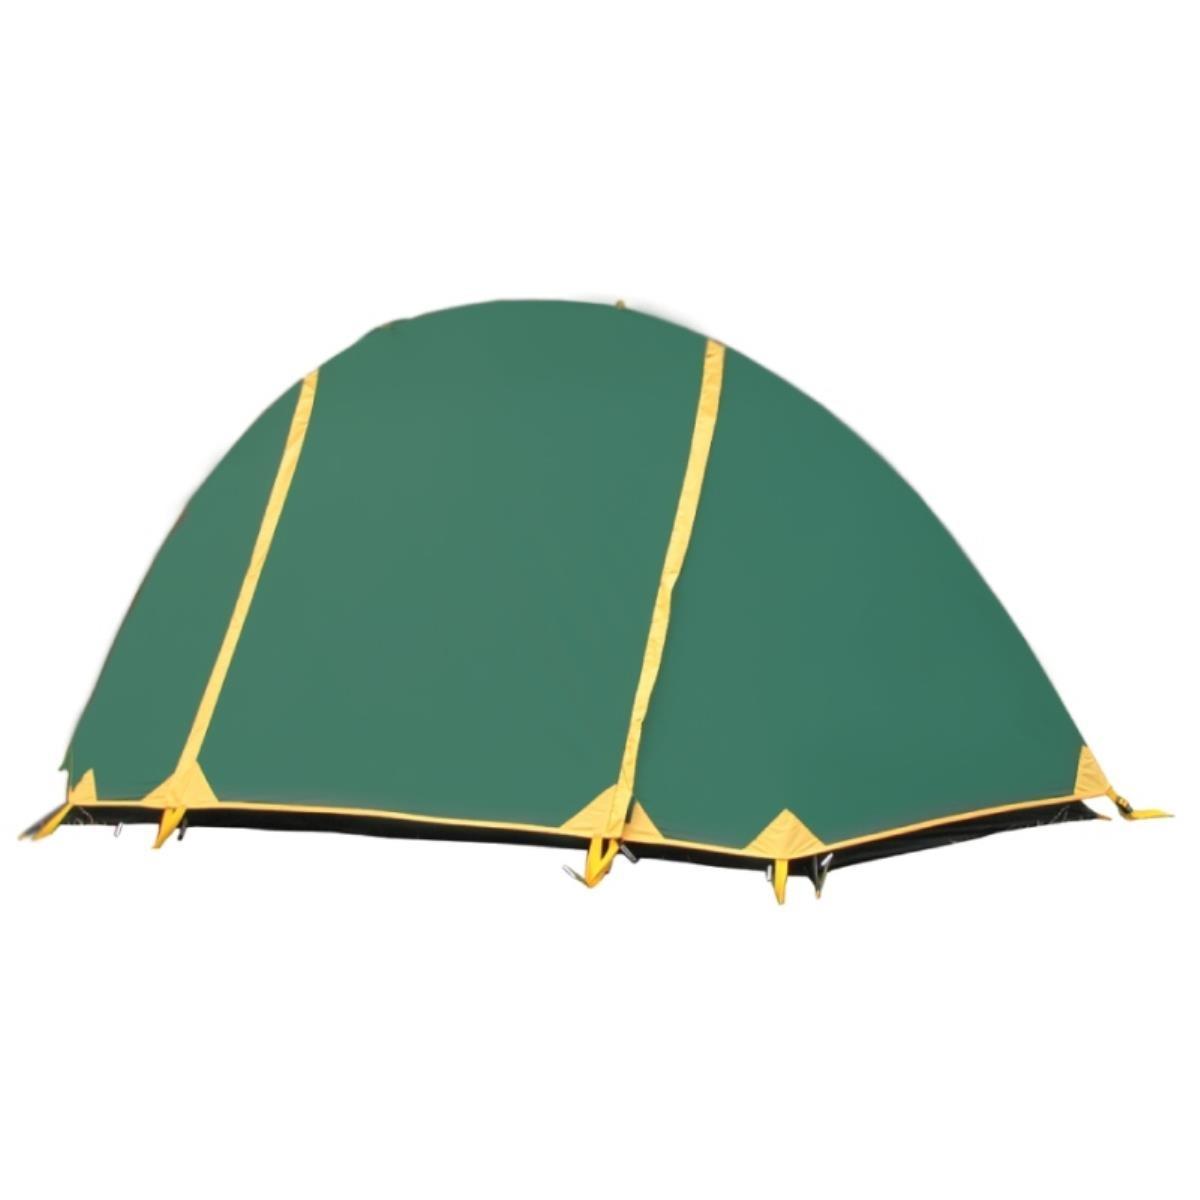 Tent bicycle light 1 V2 trt-33 Tramp